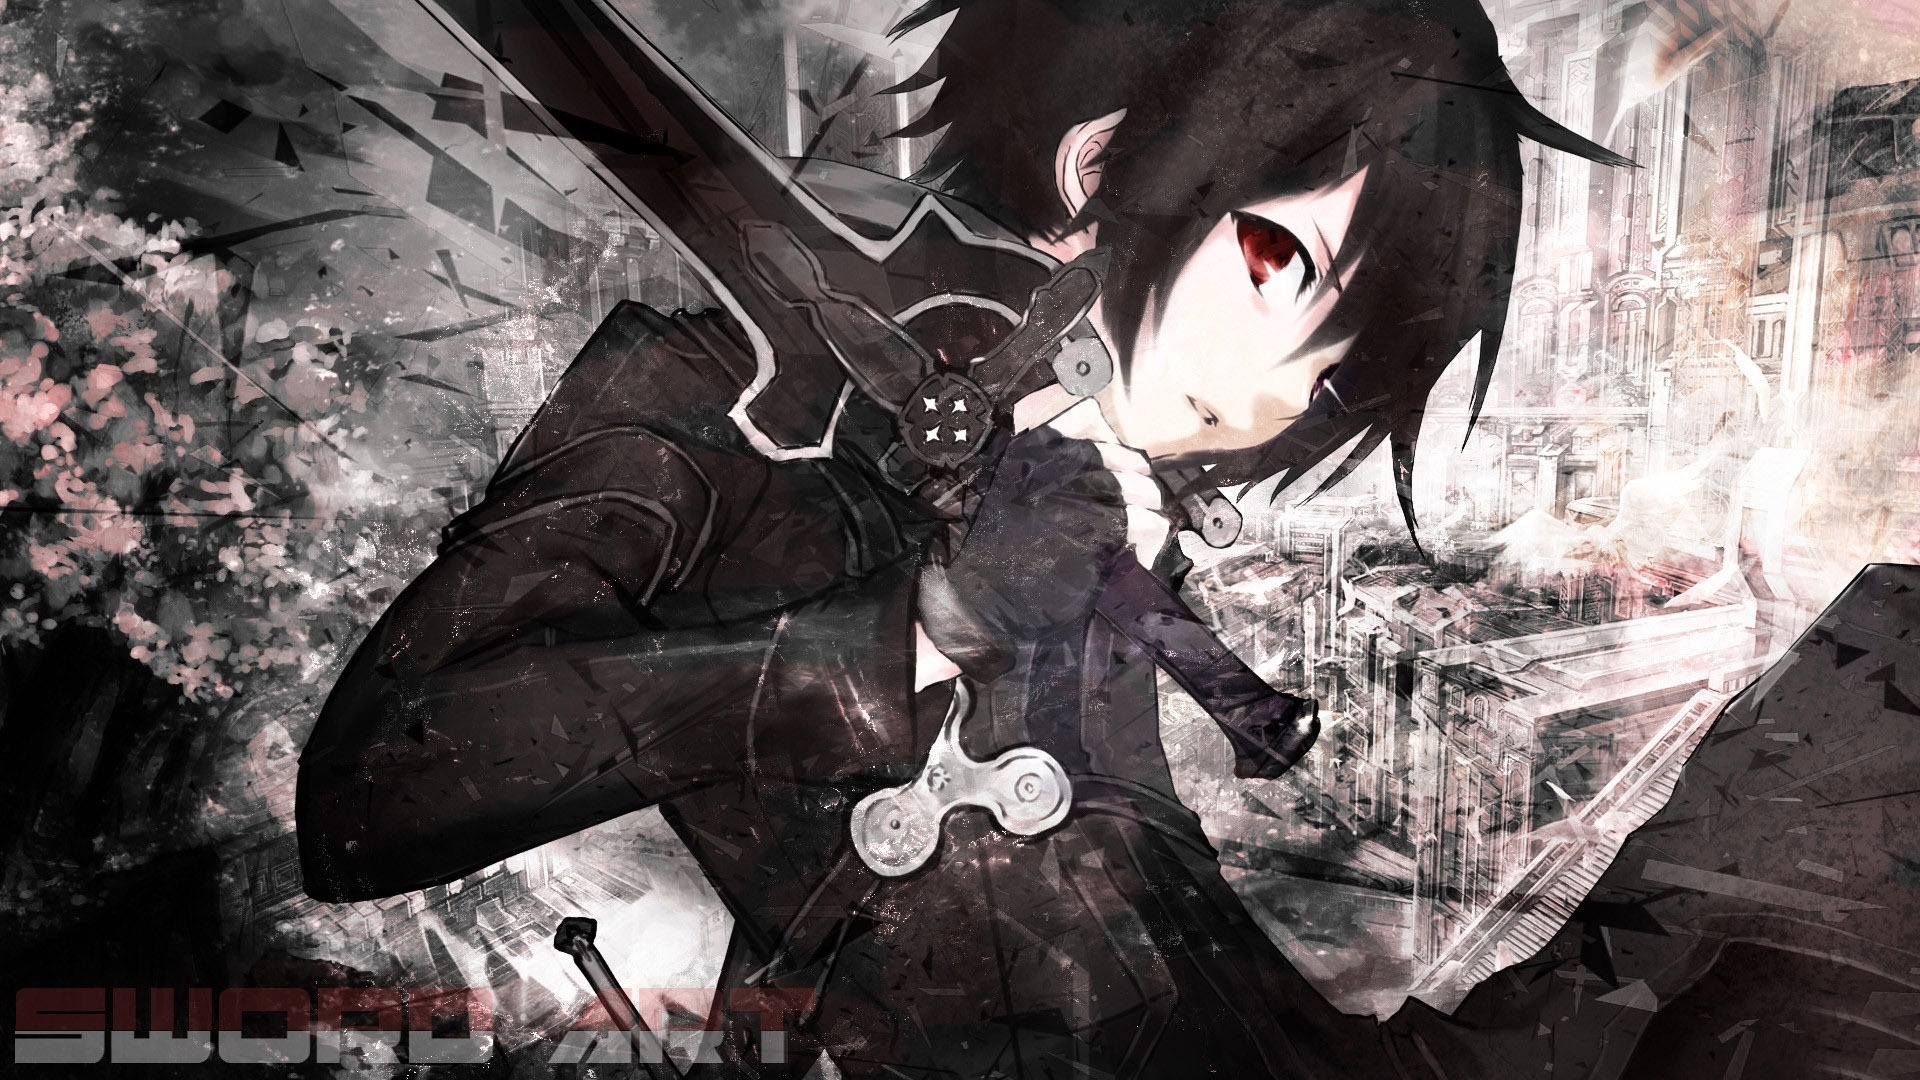 Unduh 2000+ Wallpaper Abyss Anime HD Terbaik